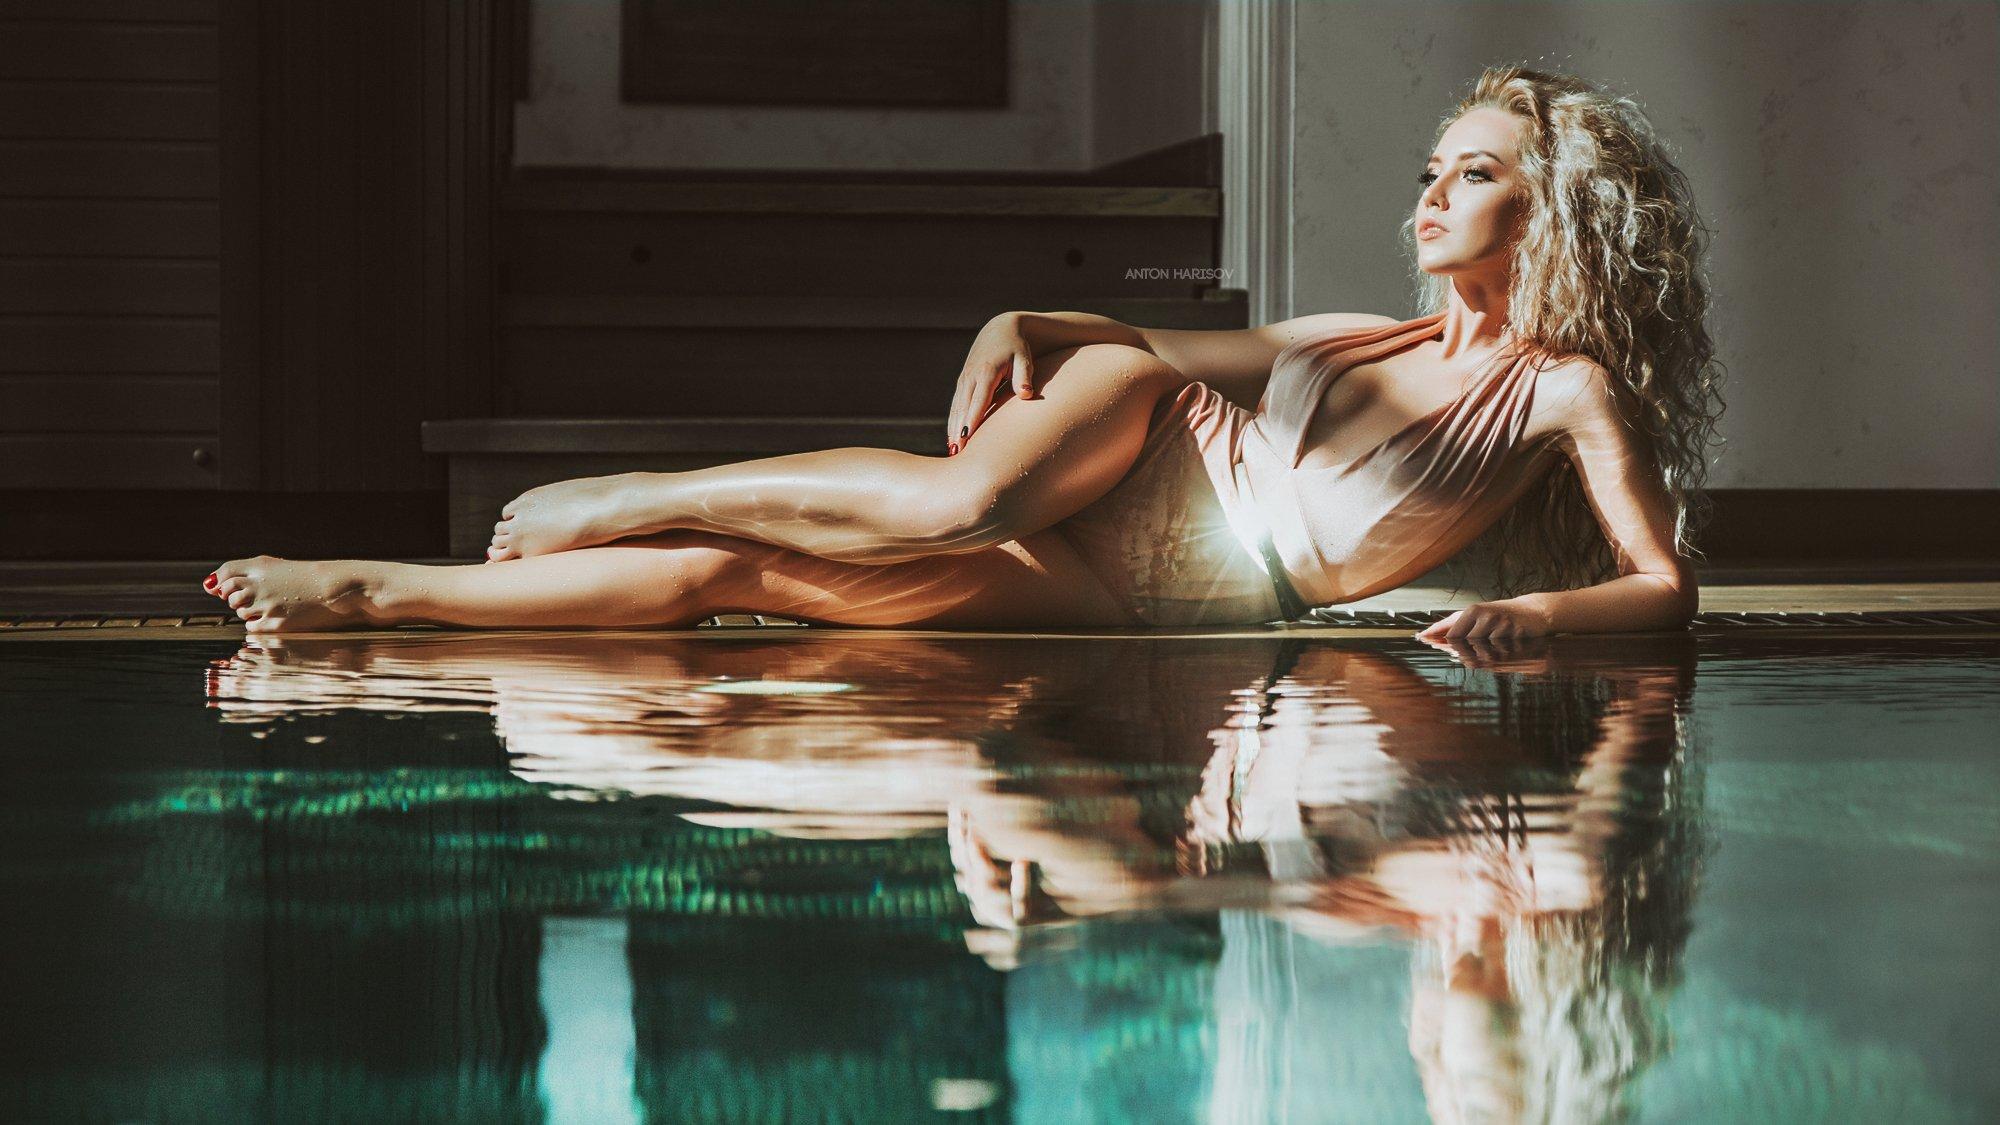 girl, portrait , awesome, people, water, cinematic, woman, luxury, water, Антон Харисов